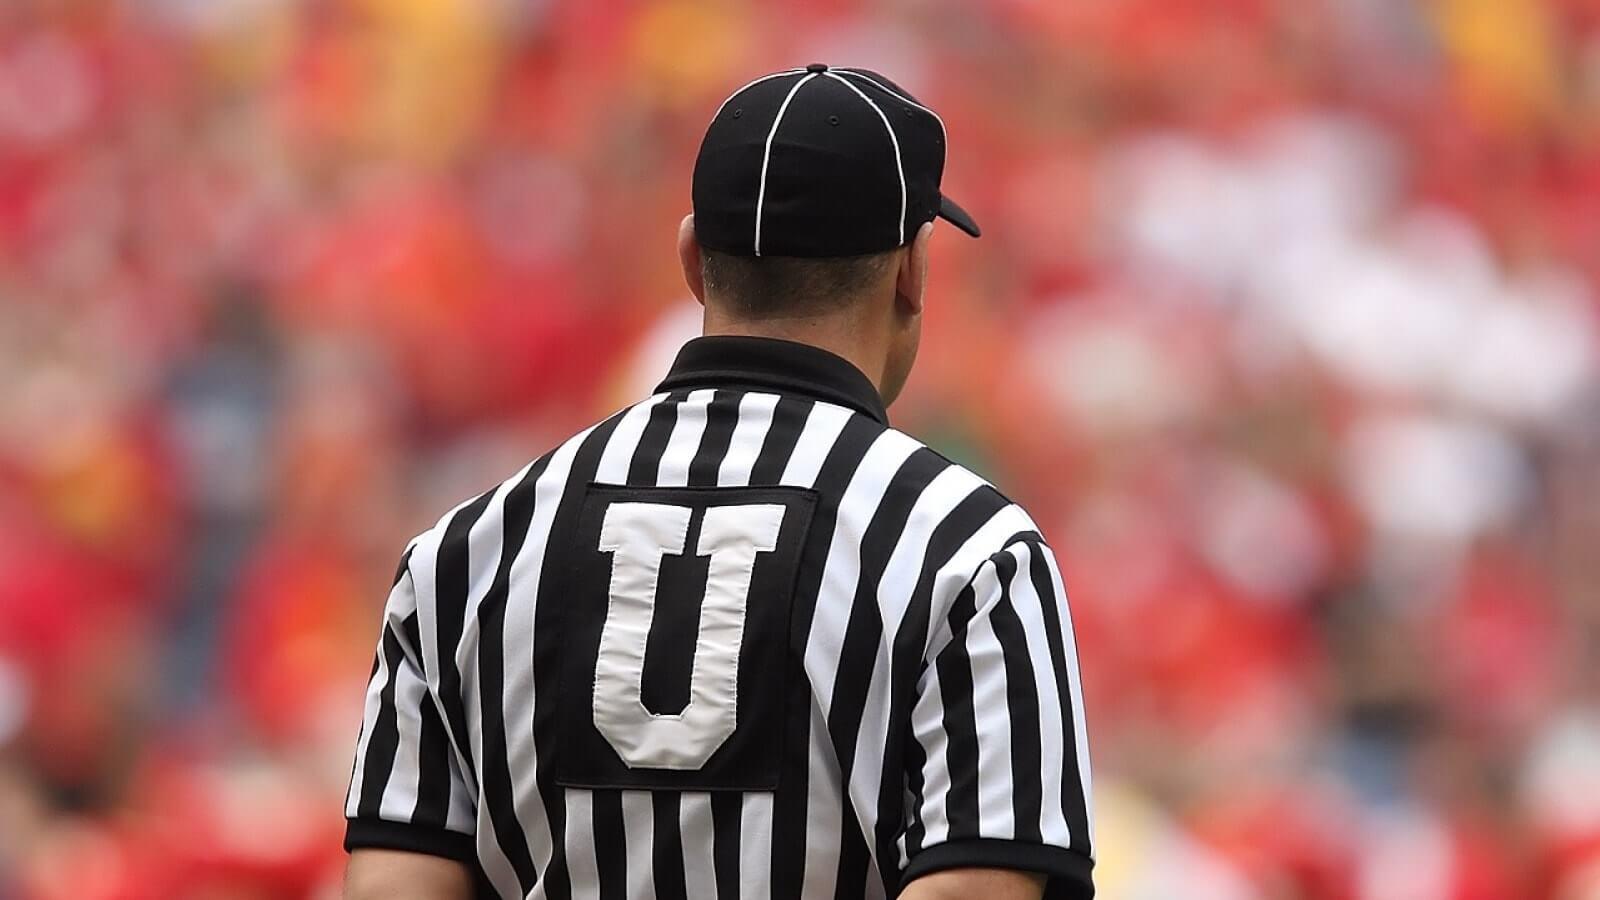 Score! Cool NFL Career Opportunities   TopResume